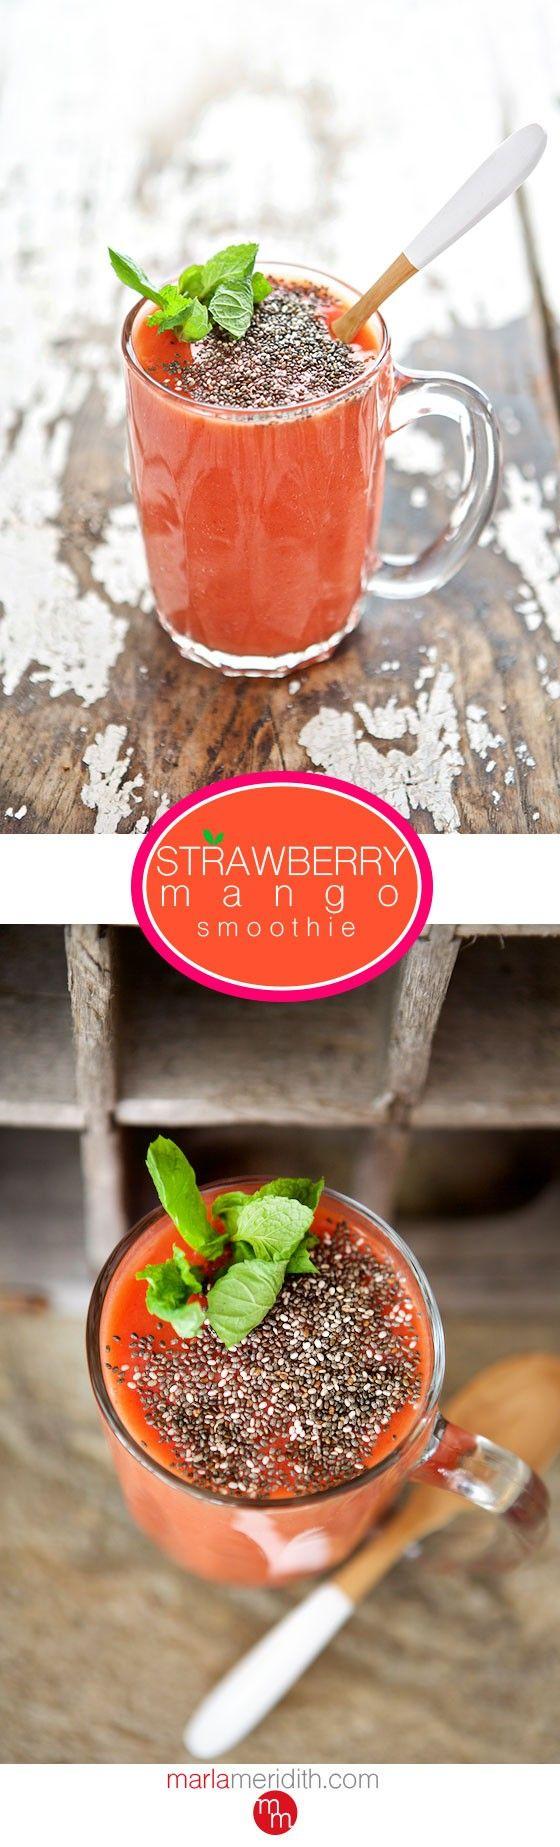 Strawberry Mango Smoothie | A perfectly healthy & fruity drink! MarlaMeridith.com #glutenfree #vegan #recipe